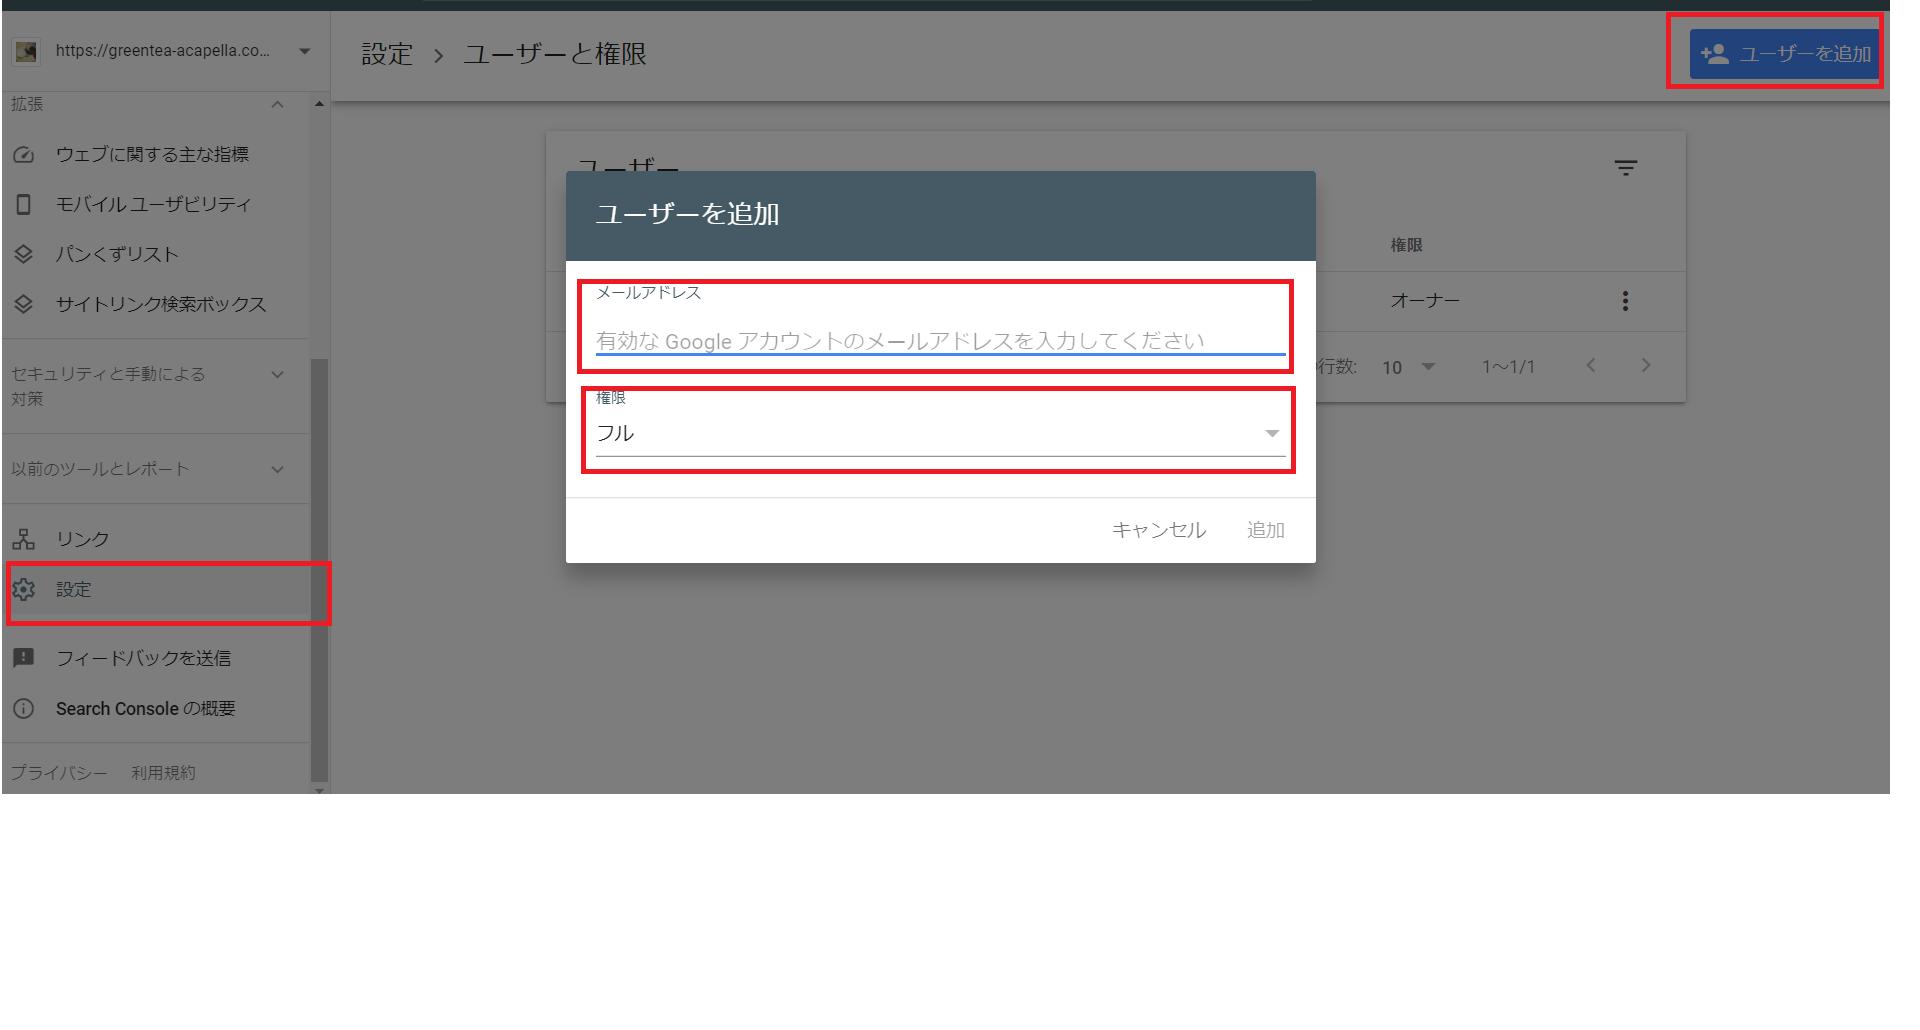 googlesearchconsoleユーザー追加